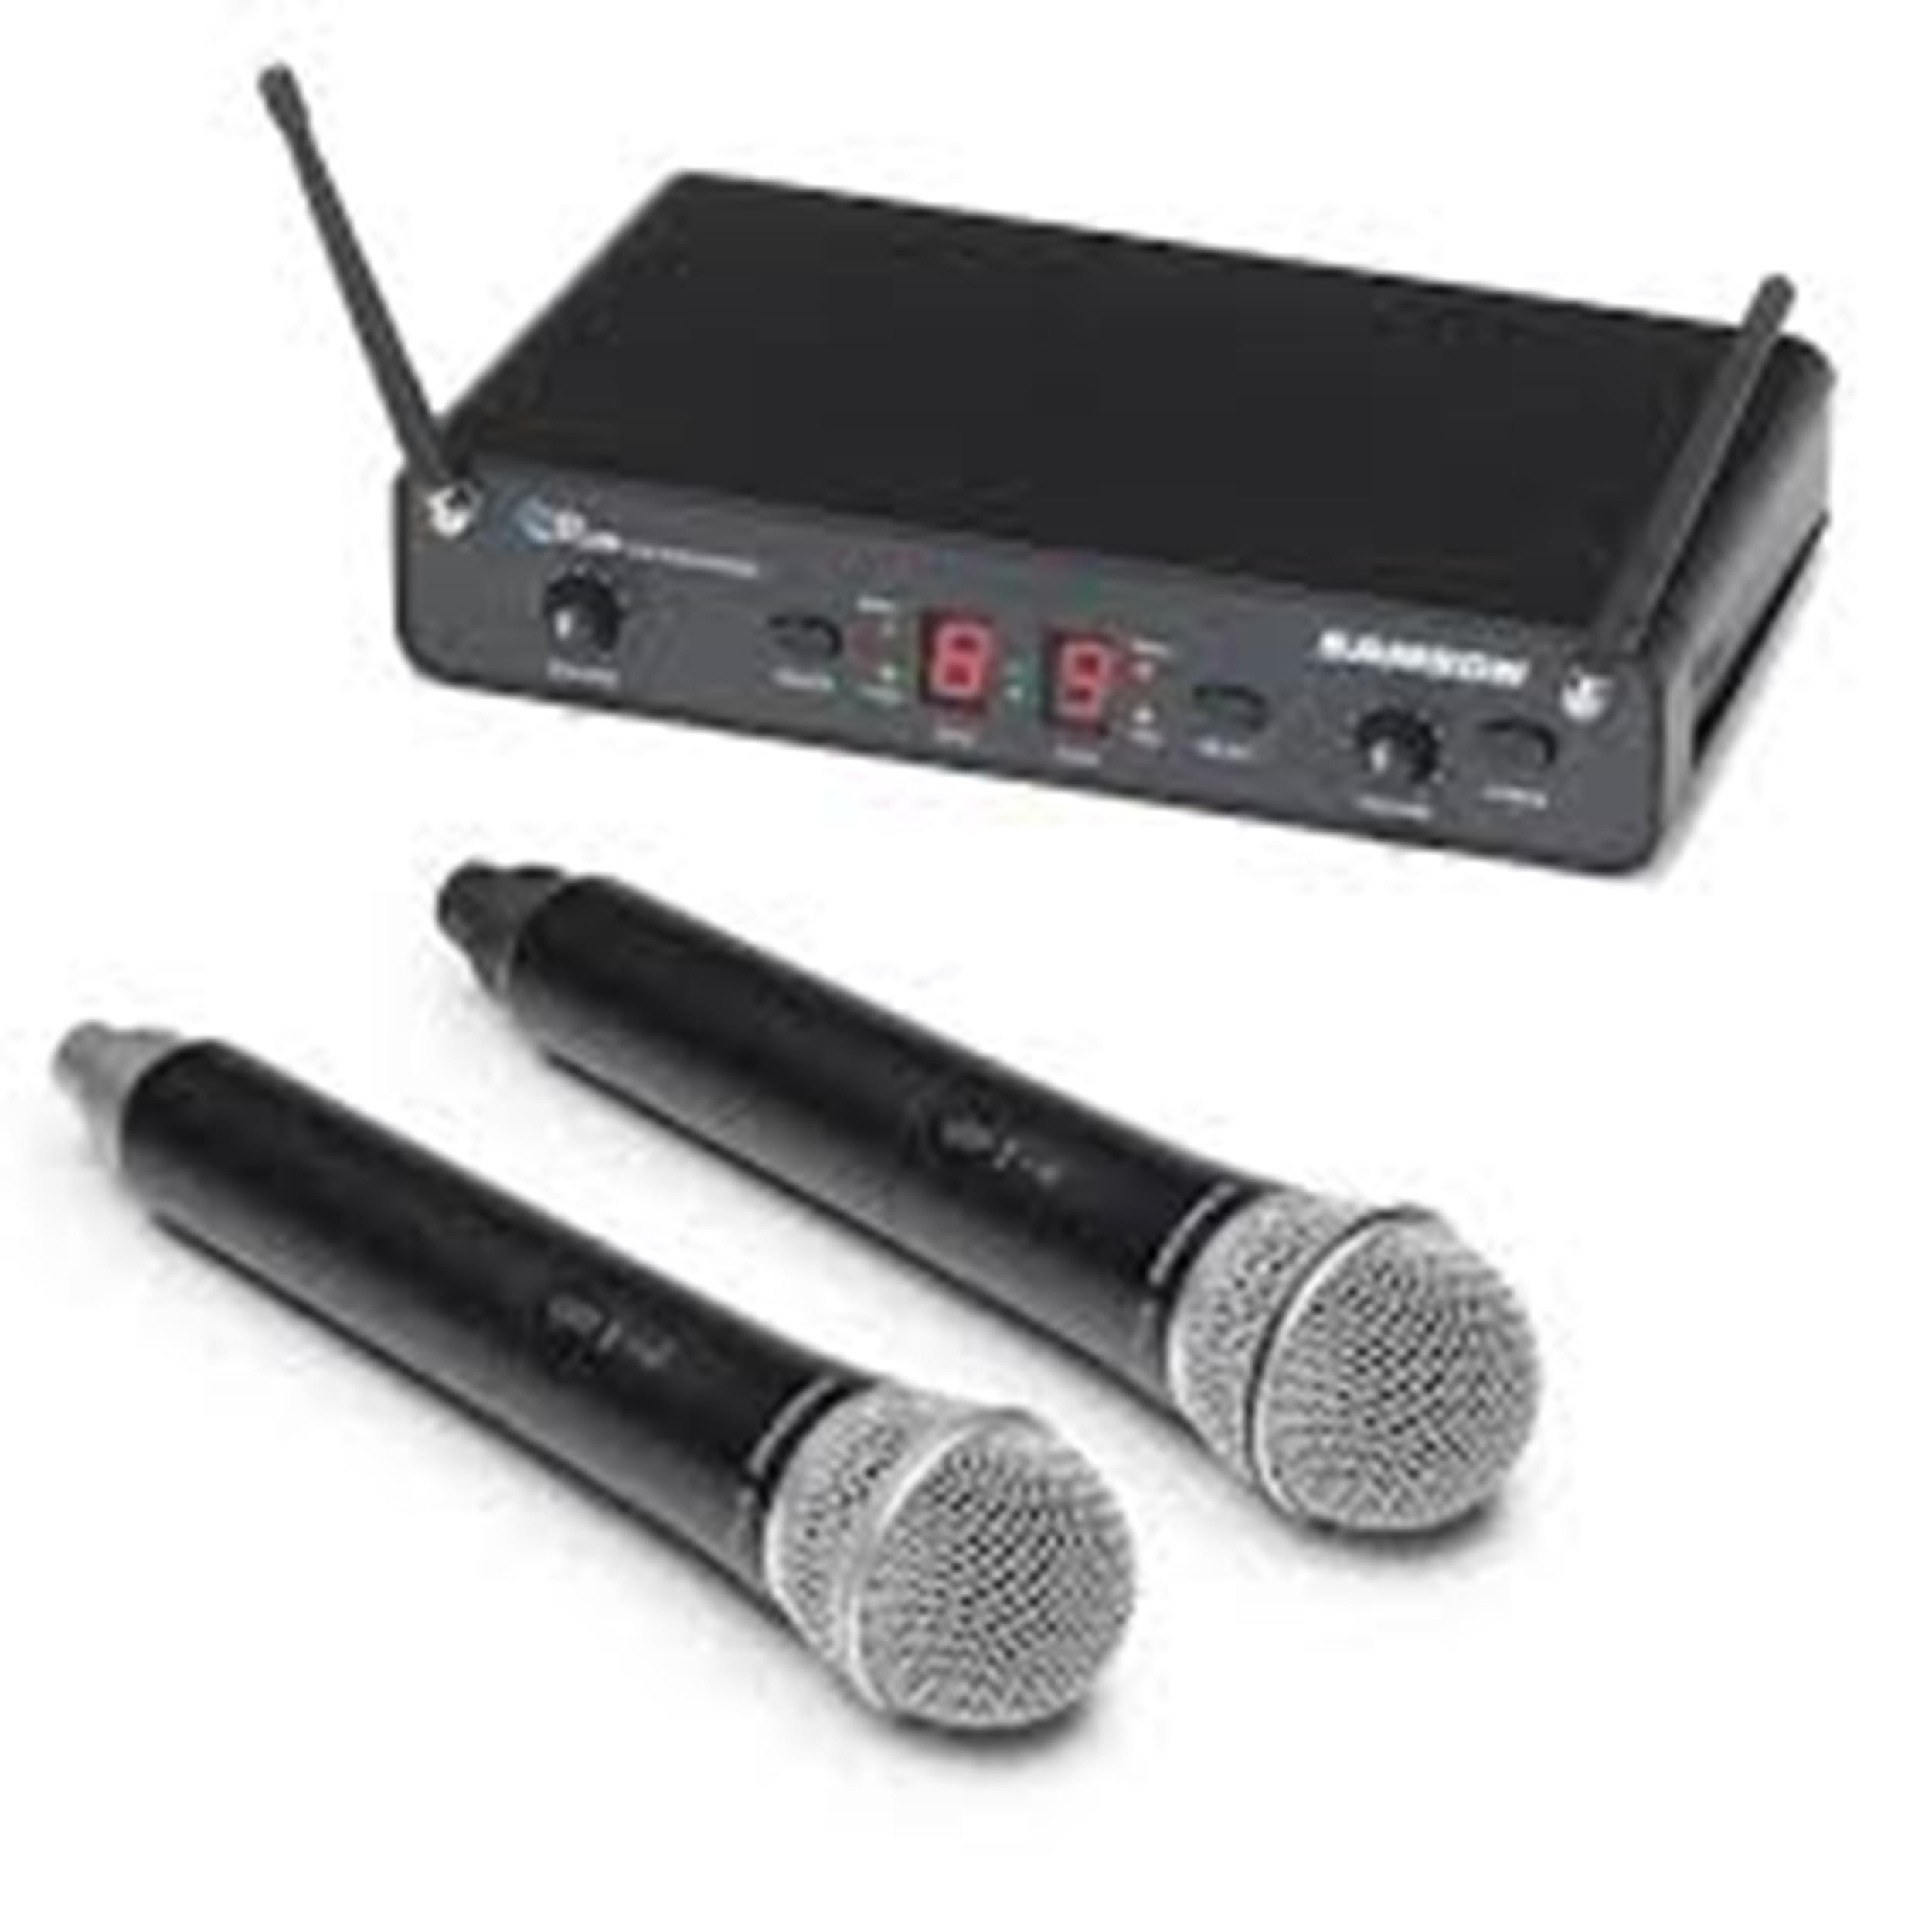 SAMSON CONCERT 288 UHF DUAL HANDHELD SYSTEM DOPPIO RADIO